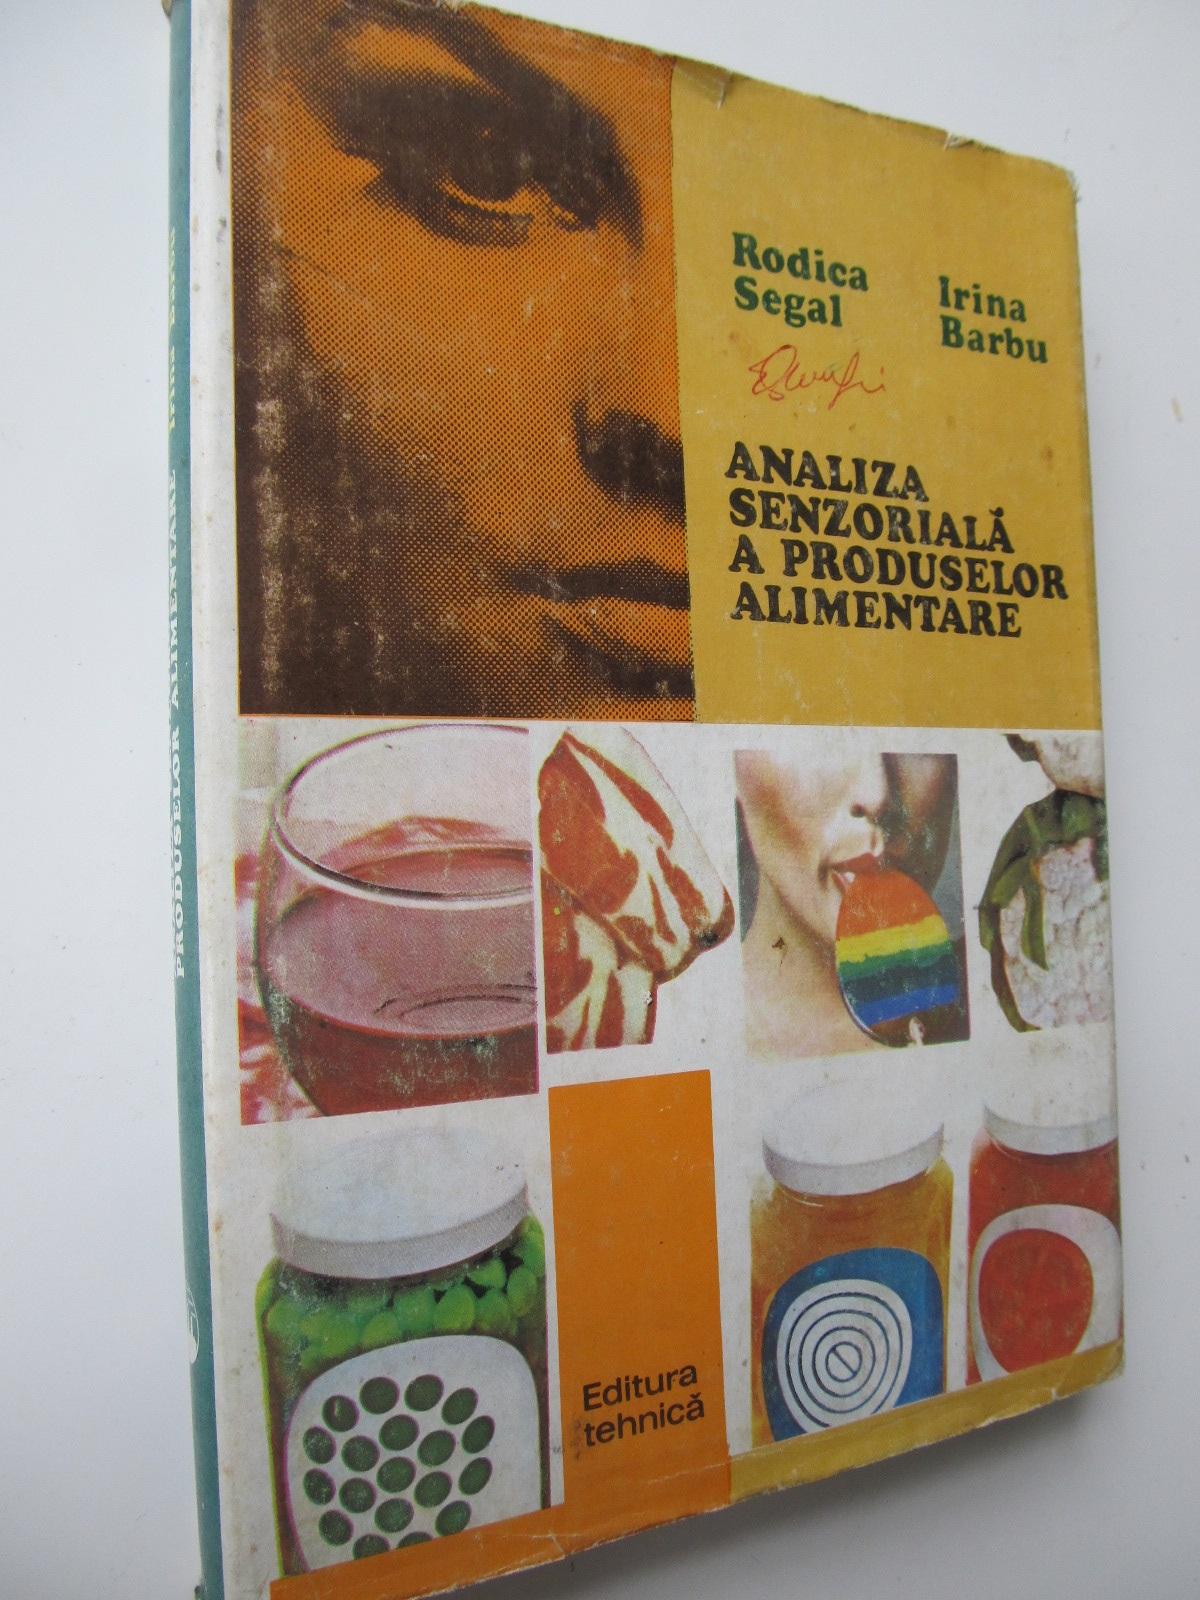 Analiza senzoriala a produselor alimentare - Rodica Segal , Irina Barbu | Detalii carte